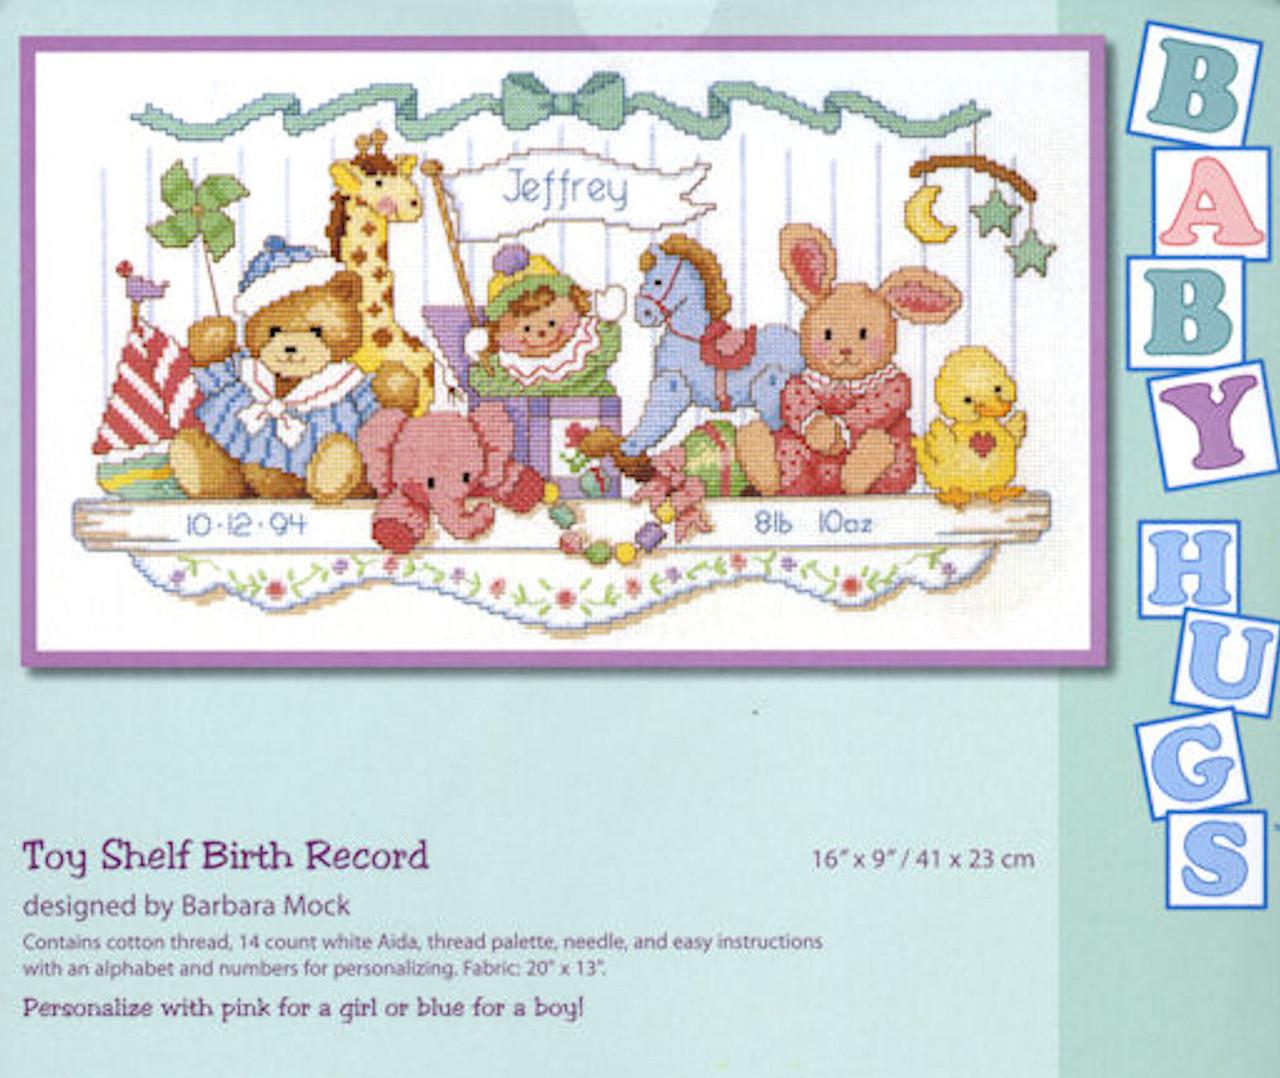 Dimensions - Toy Shelf Birth Record